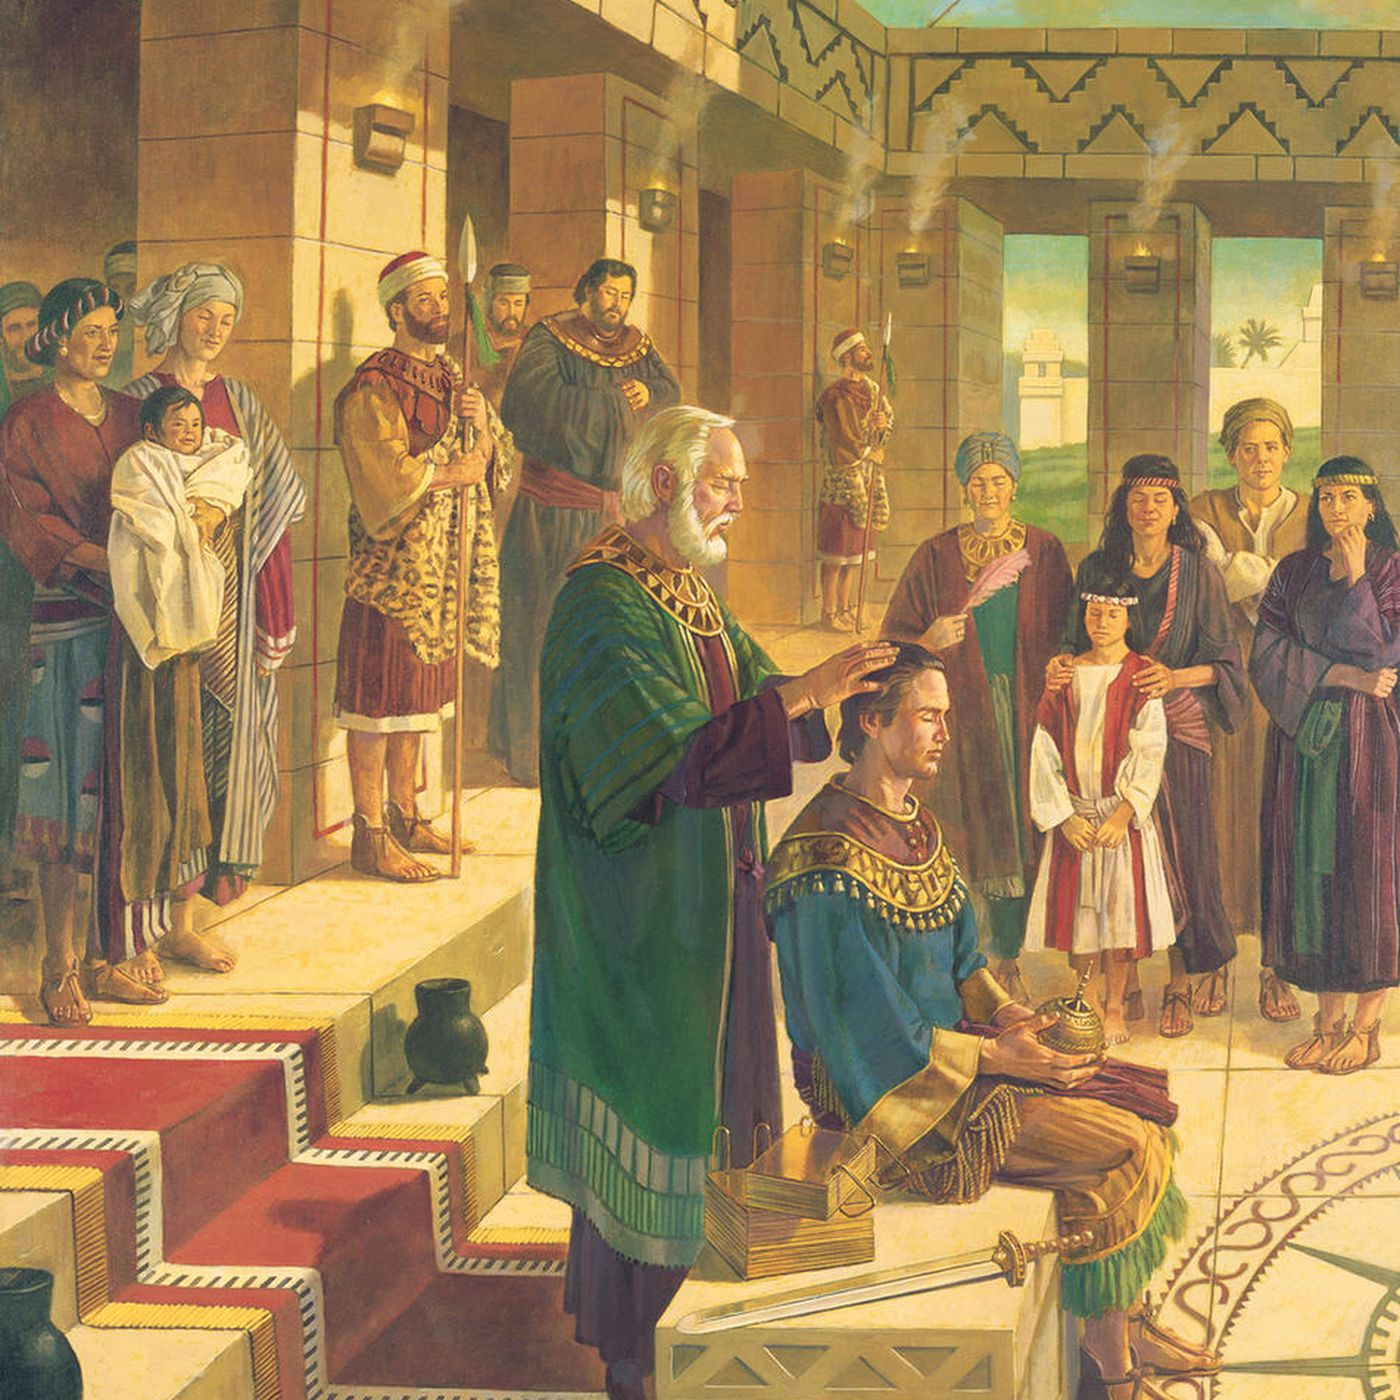 The Book of Mormon30